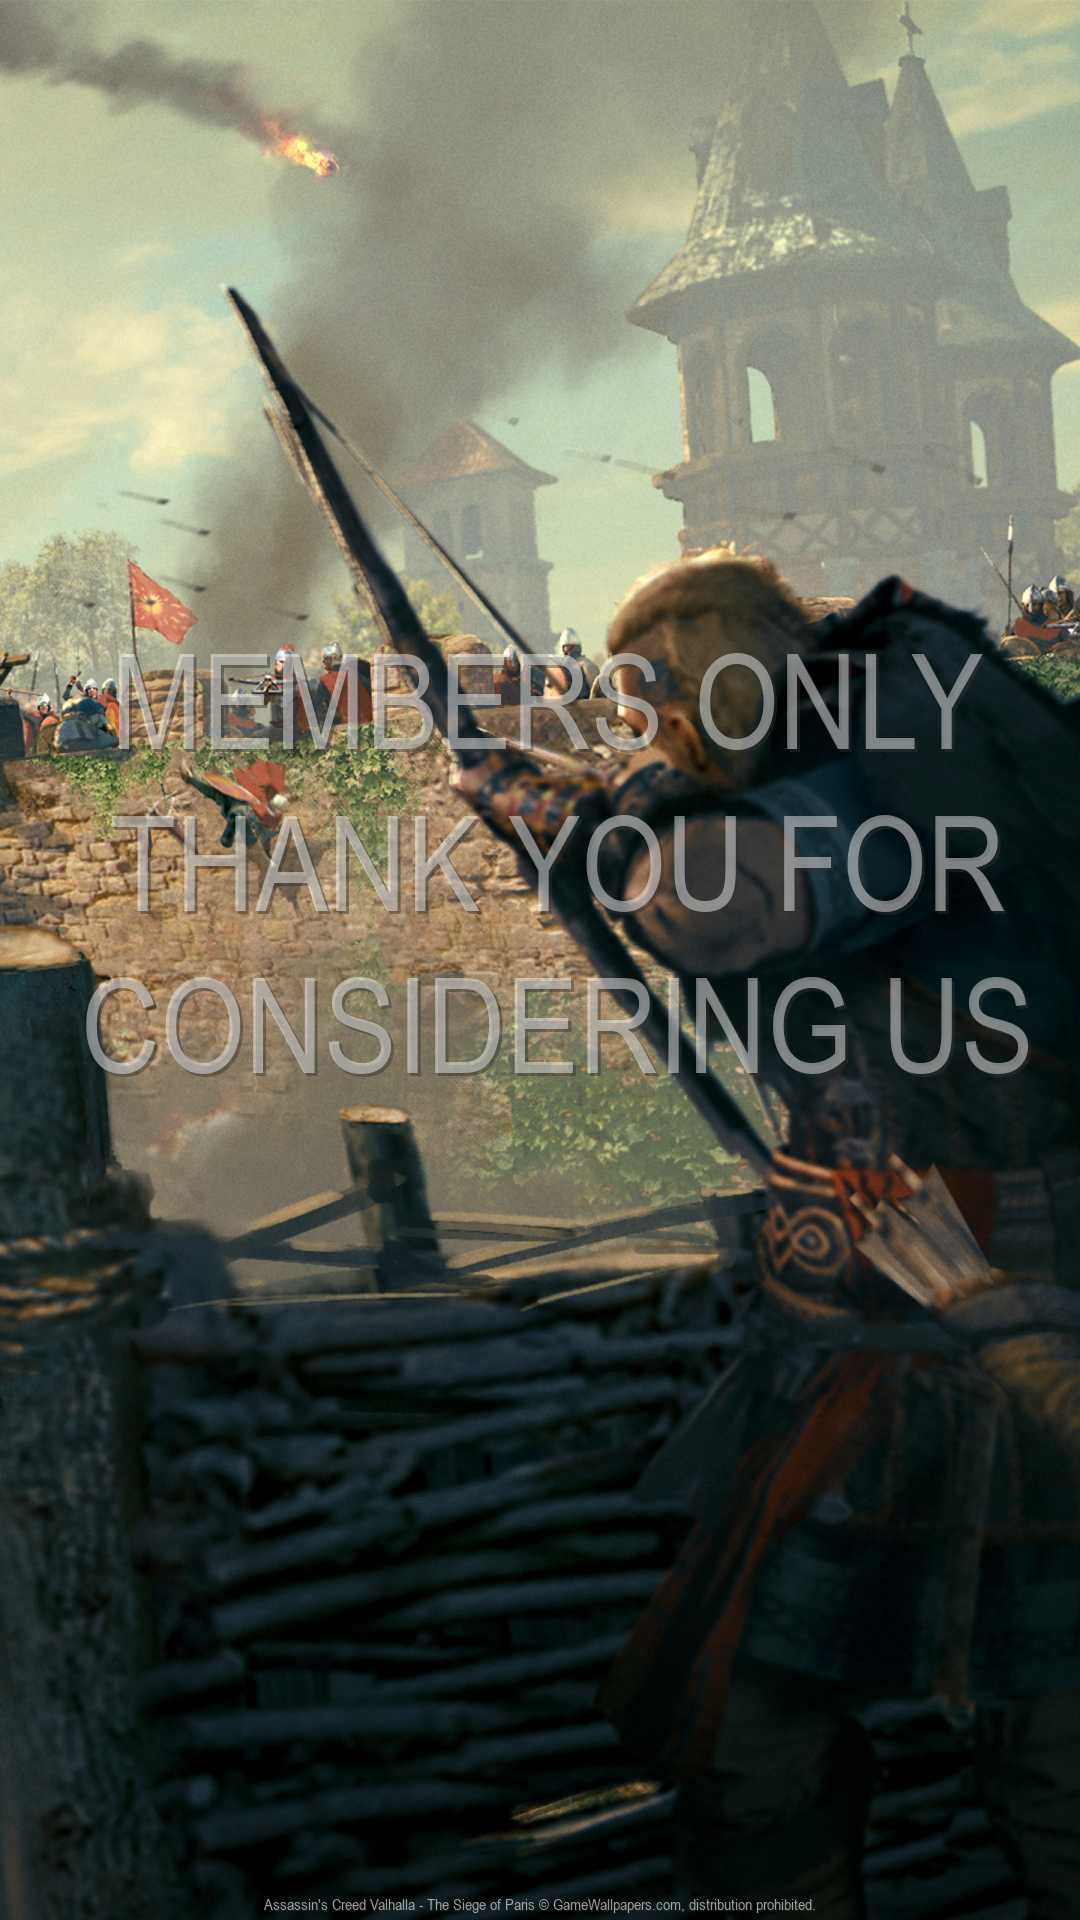 Assassin's Creed: Valhalla - The Siege of Paris 1080p Vertical Mobiele achtergrond 02